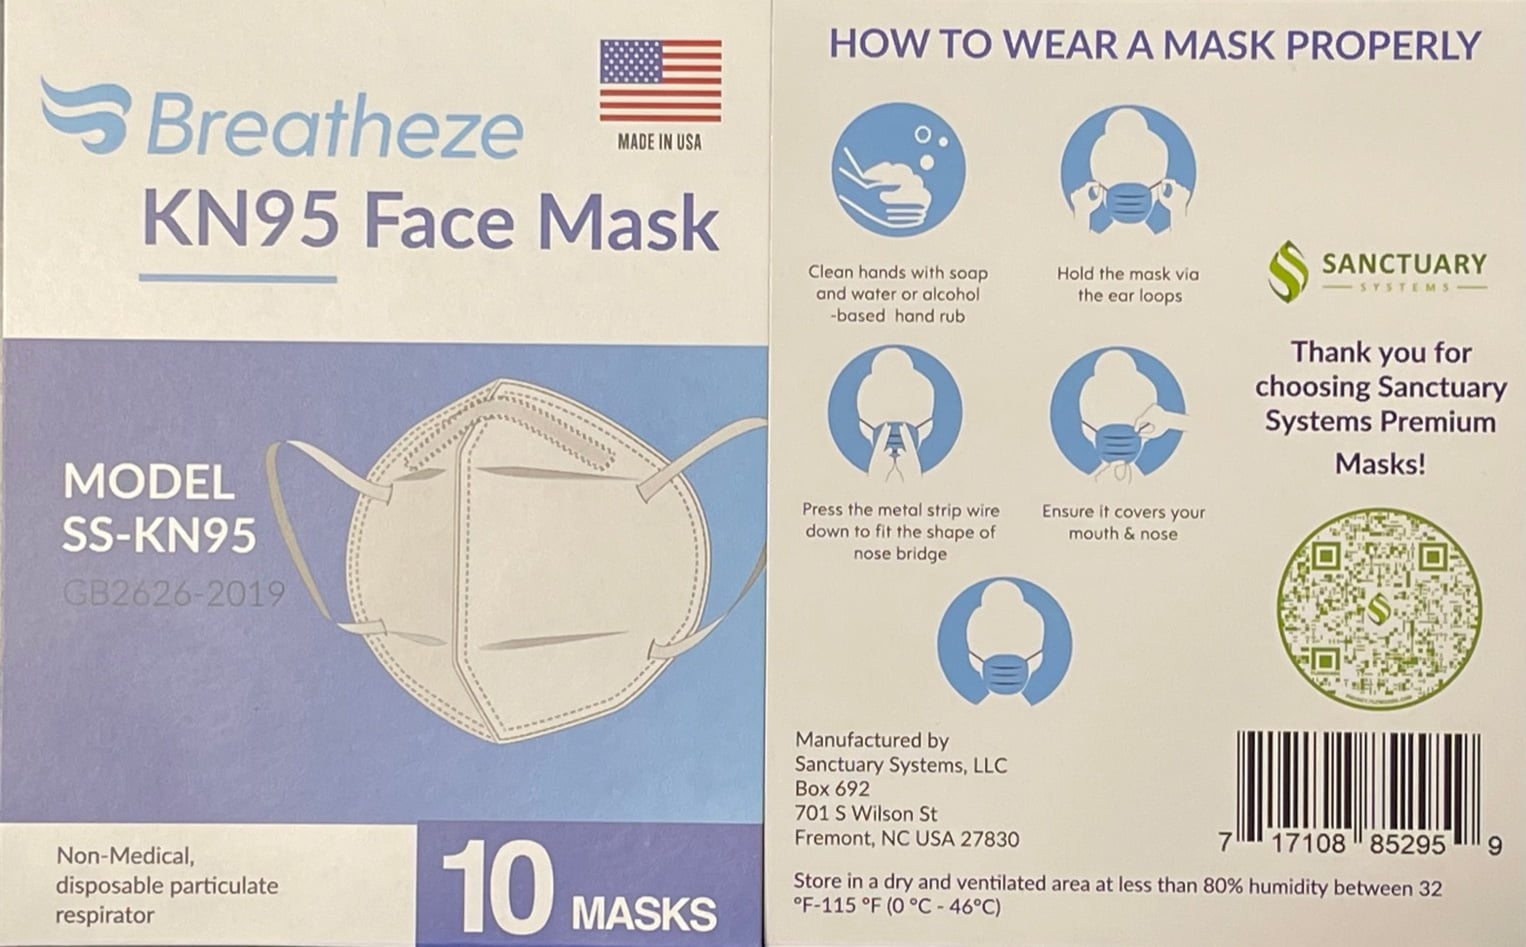 Sanctuary Systems, LLC Announces Availability of Breatheze SS-KN95 Masks